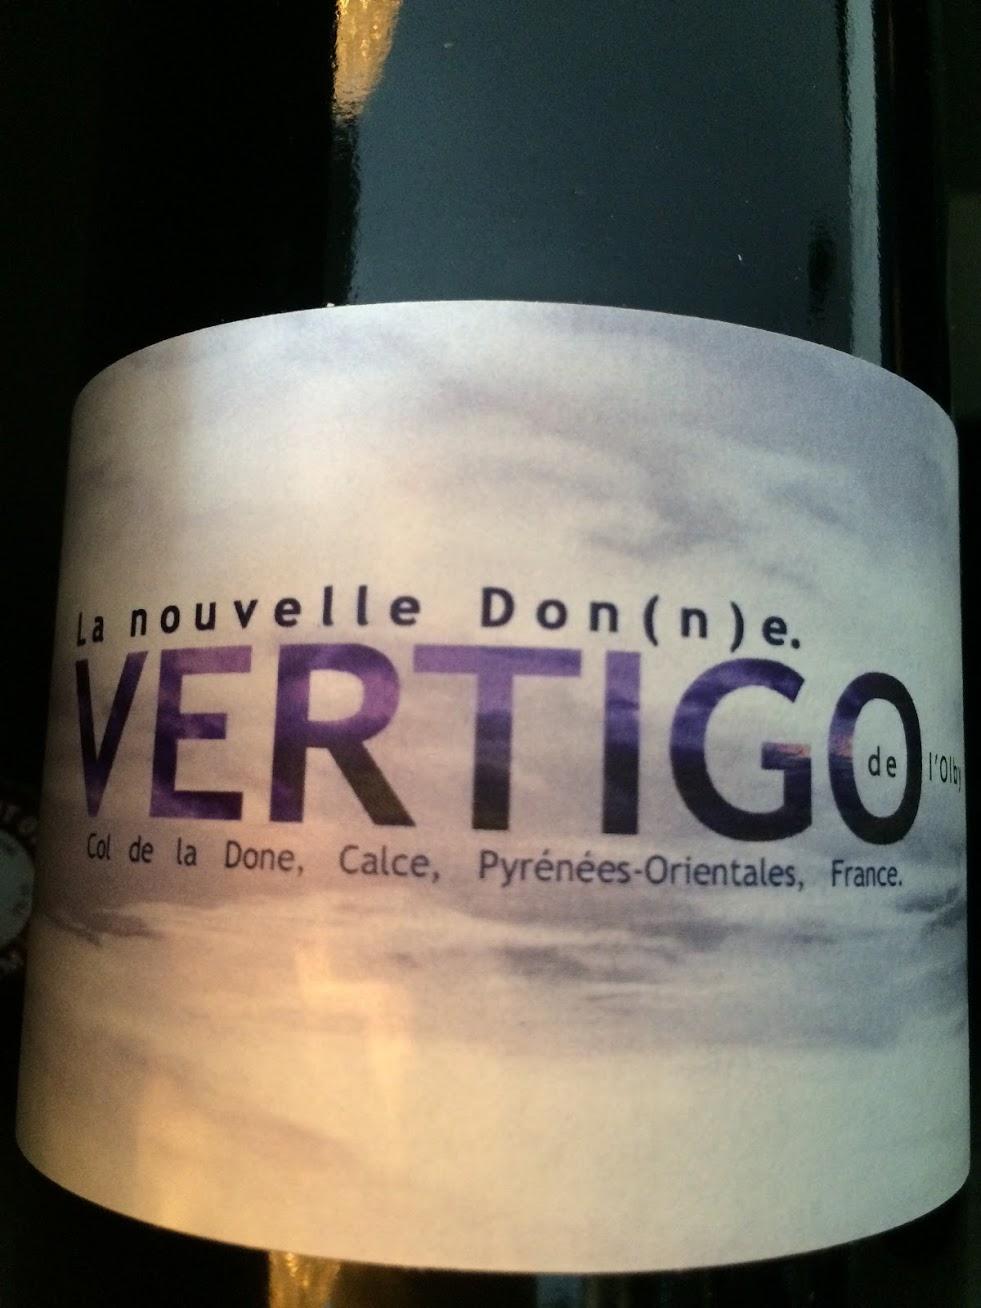 La Nouvelle Don(n)e - Vertigo - Rouge